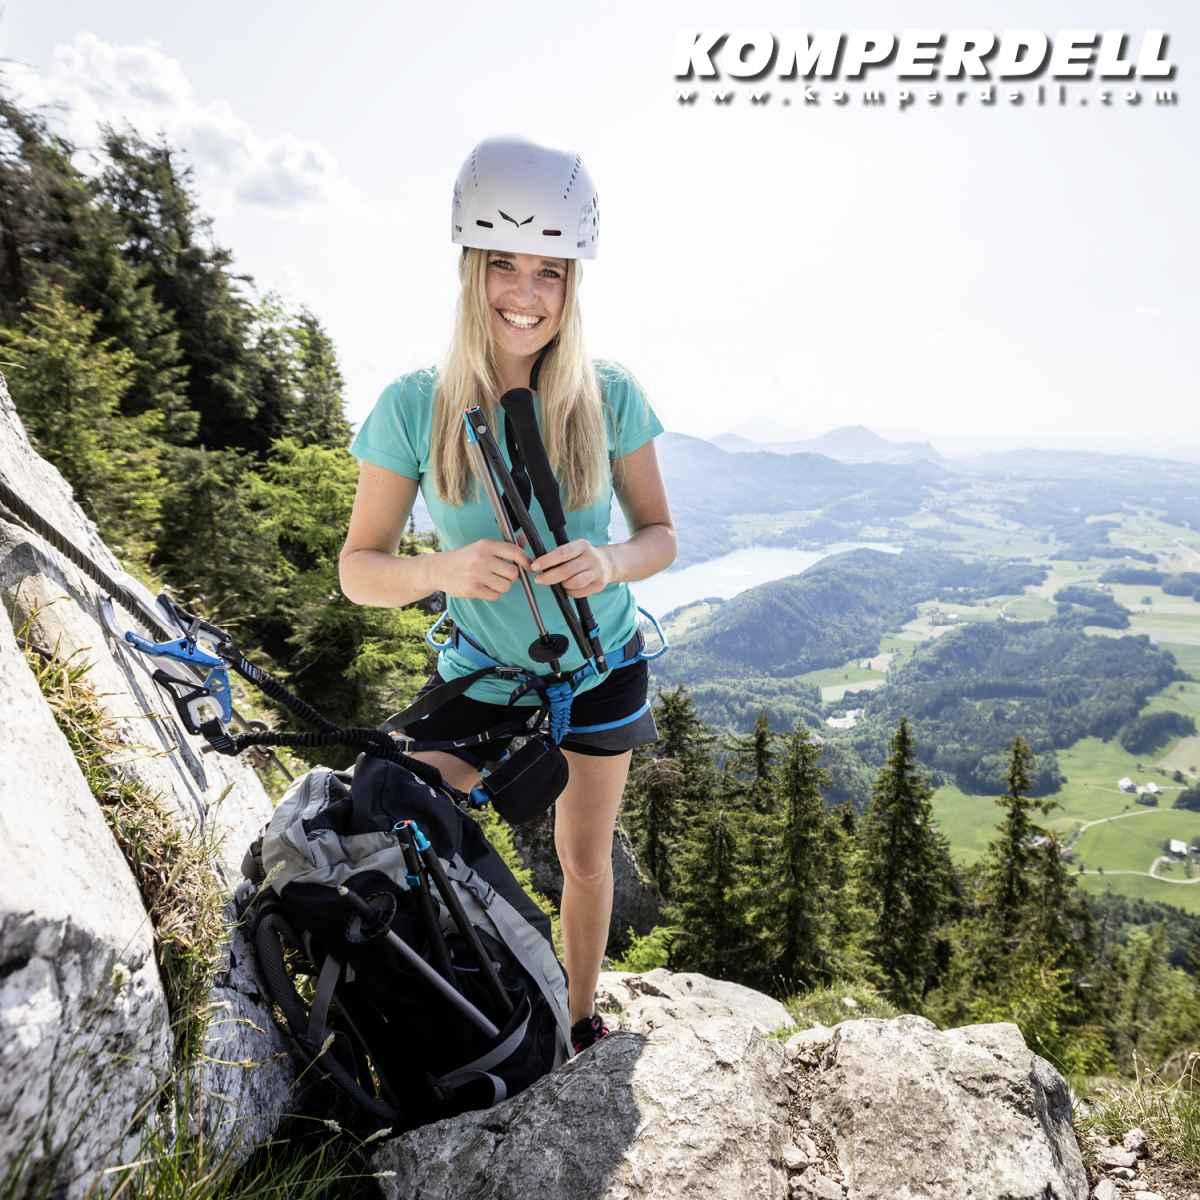 Kije do biegania w górach Carbon 1942351-10 KOMPERDELL